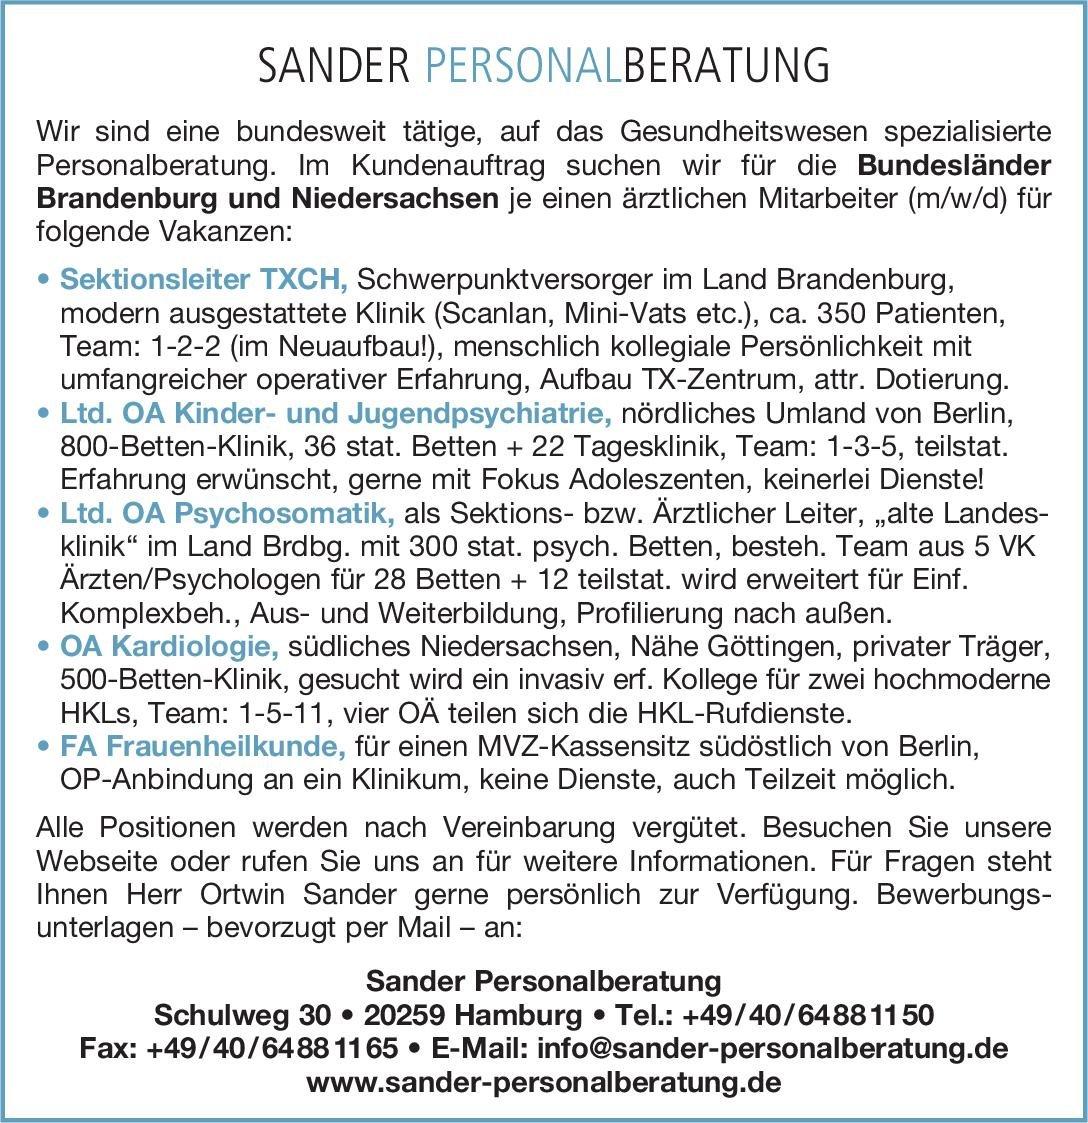 Sander Personalberatung Ltd. OA Psychosomatik Psychosomatische Medizin und Psychotherapie Oberarzt